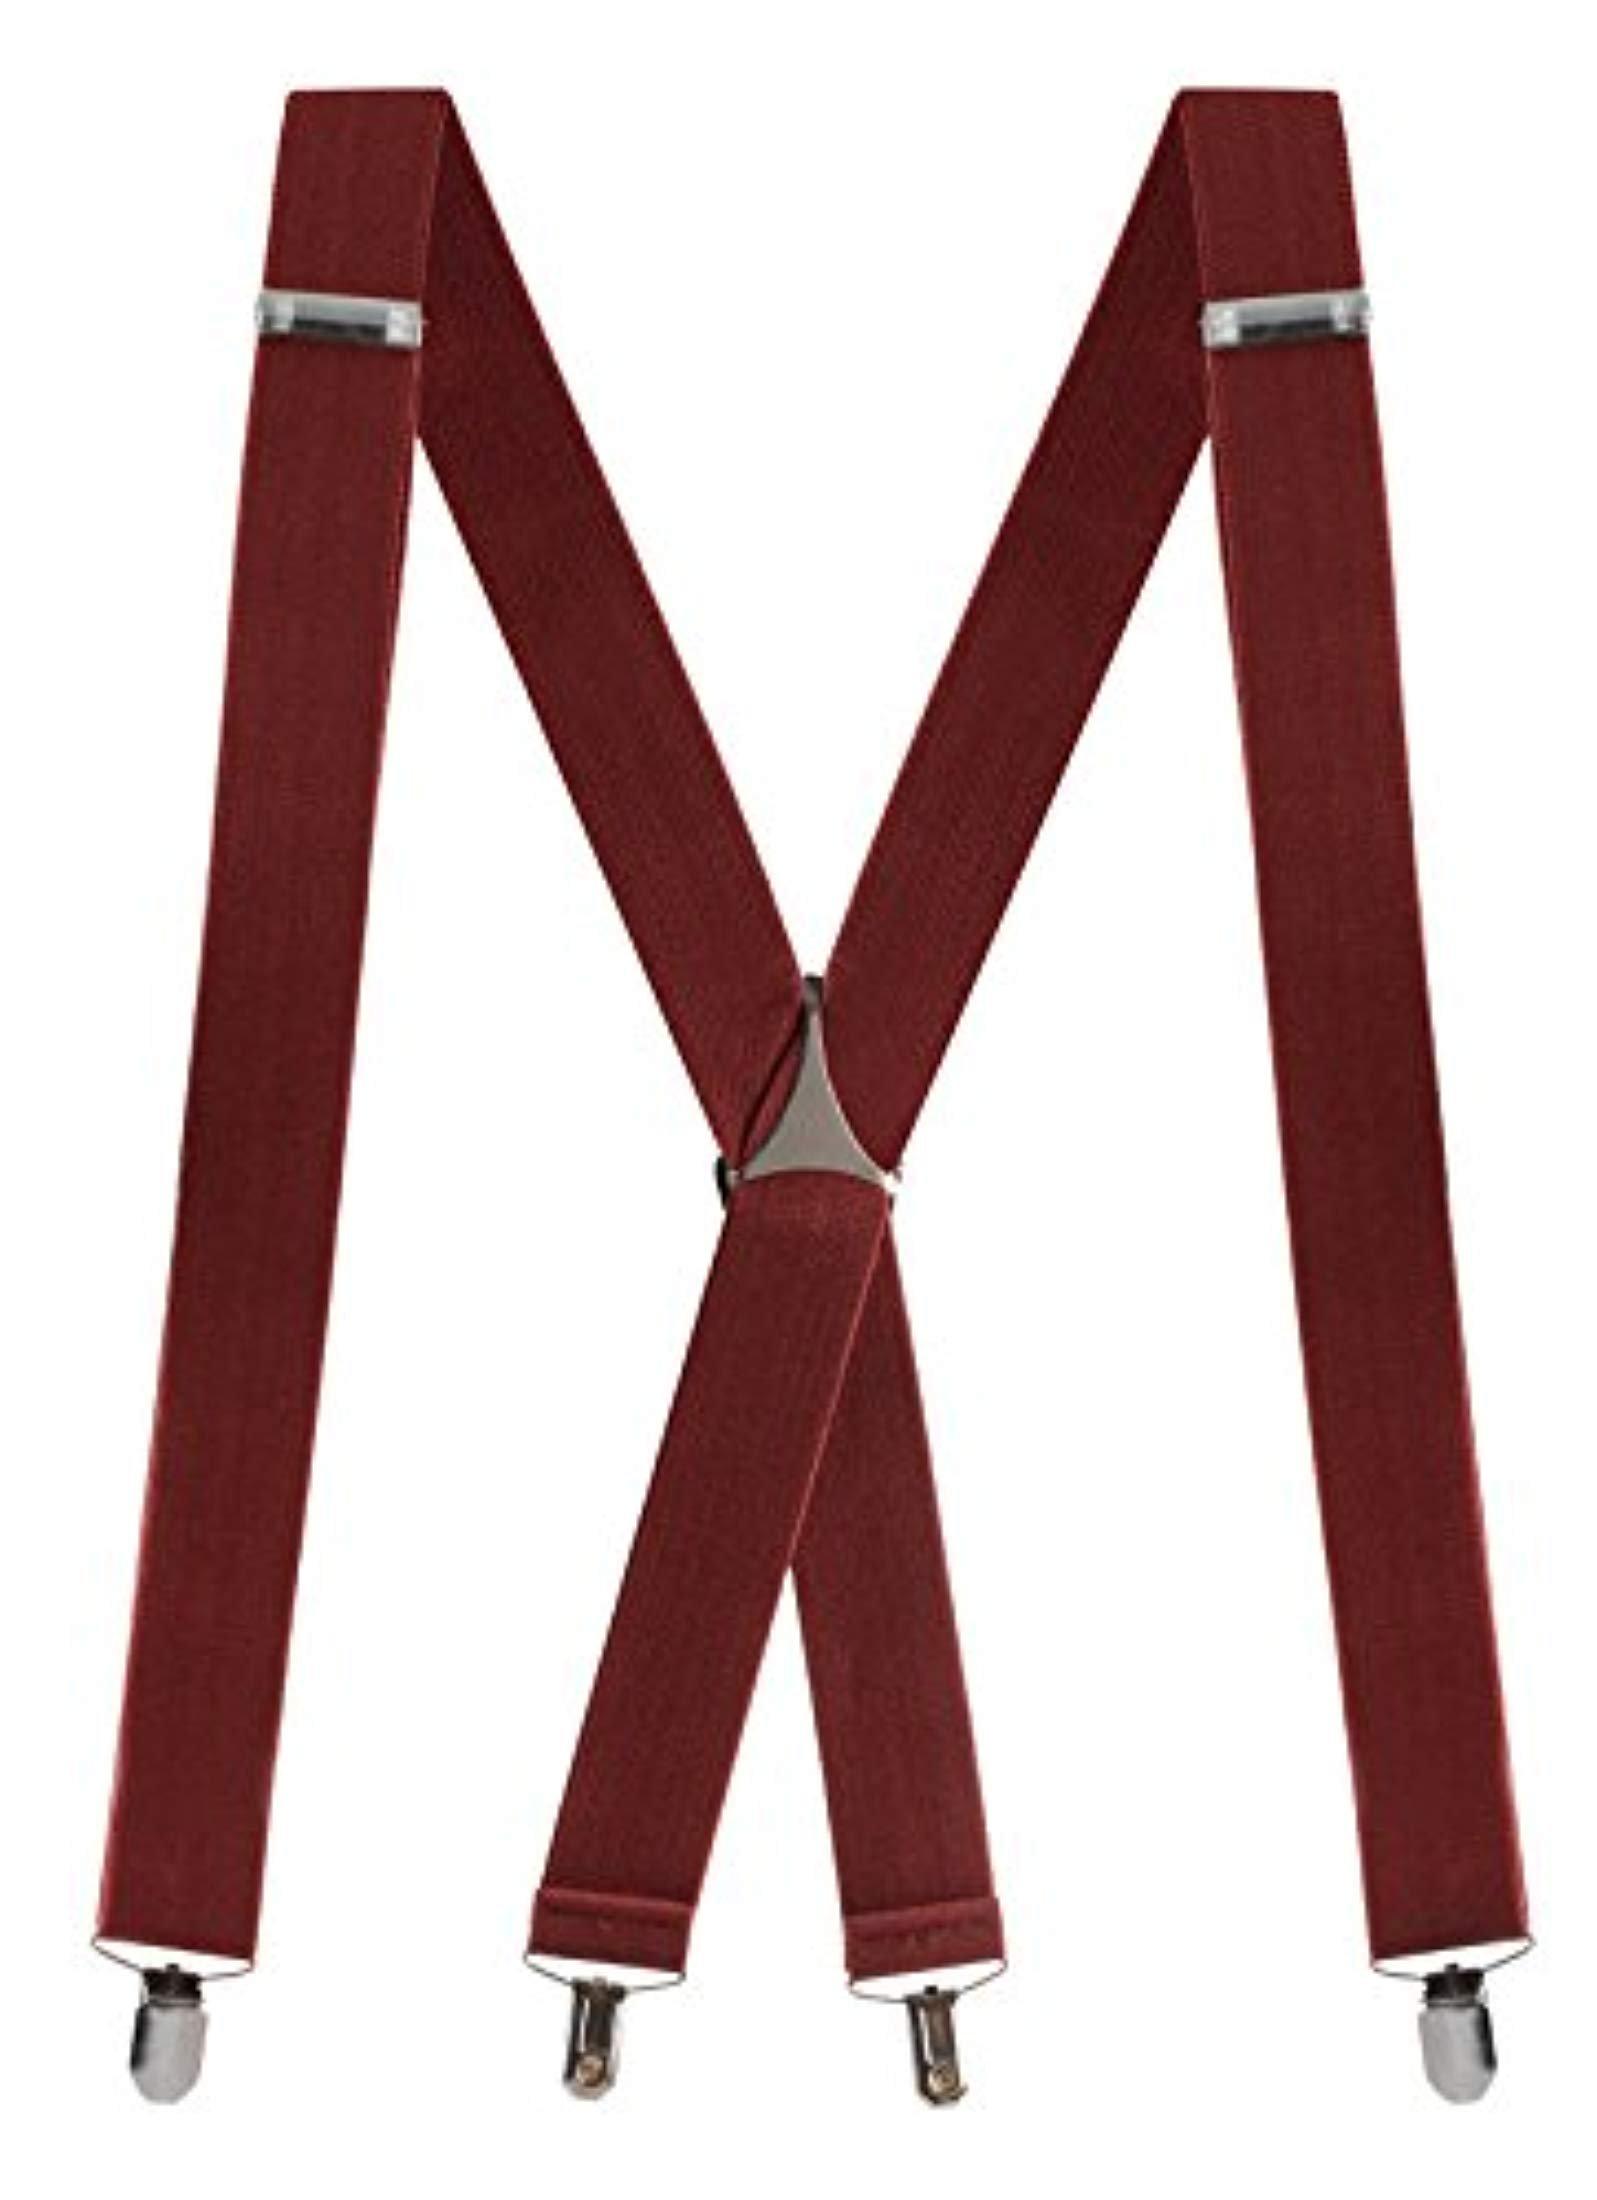 "Buyless Fashion Mens 48'' Elastic Adjustable 1 1/4"" Suspenders In X Shape – Burgundy"